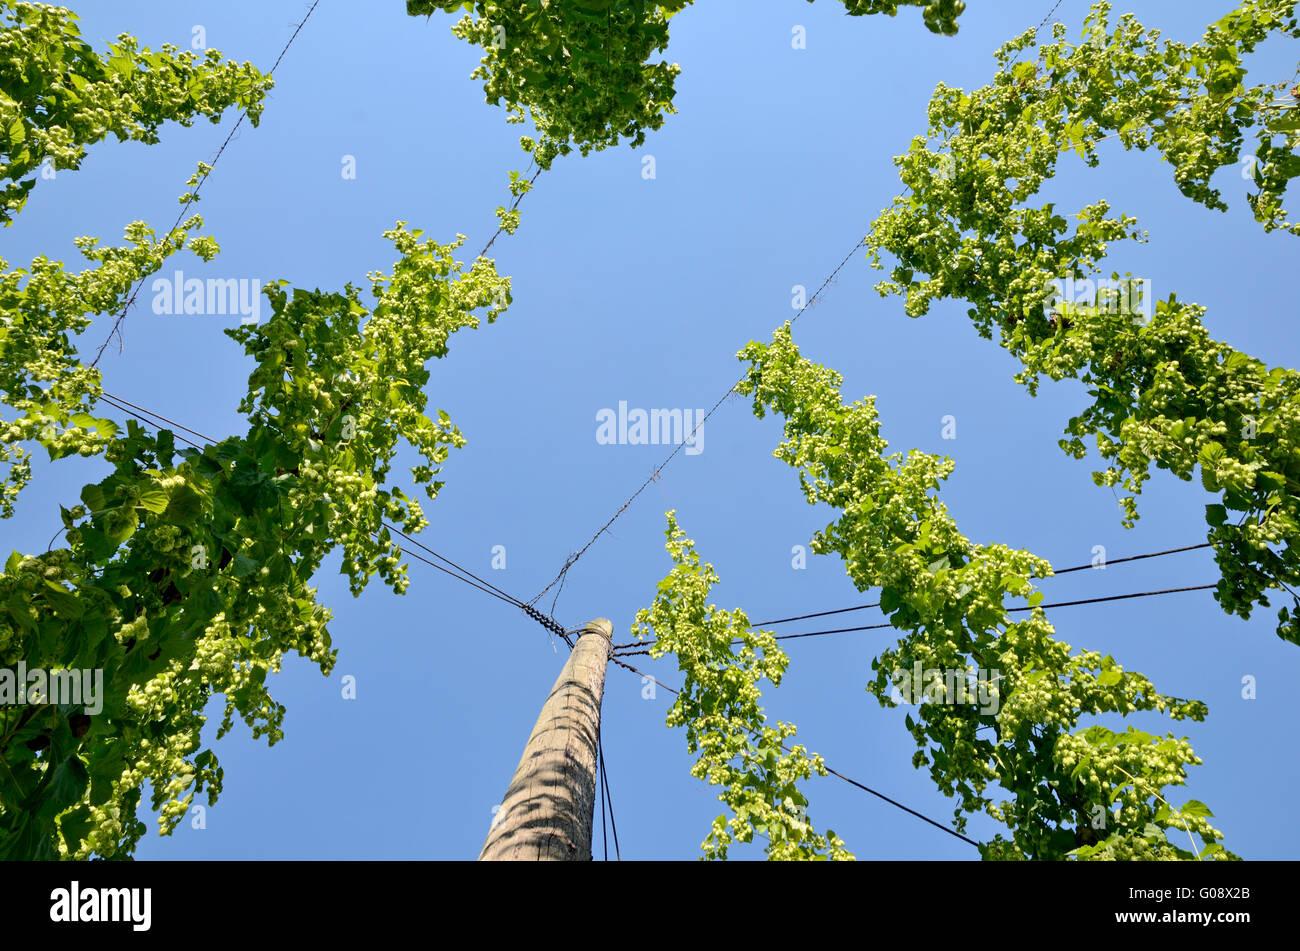 Kletterdraht Stockfotos & Kletterdraht Bilder - Alamy